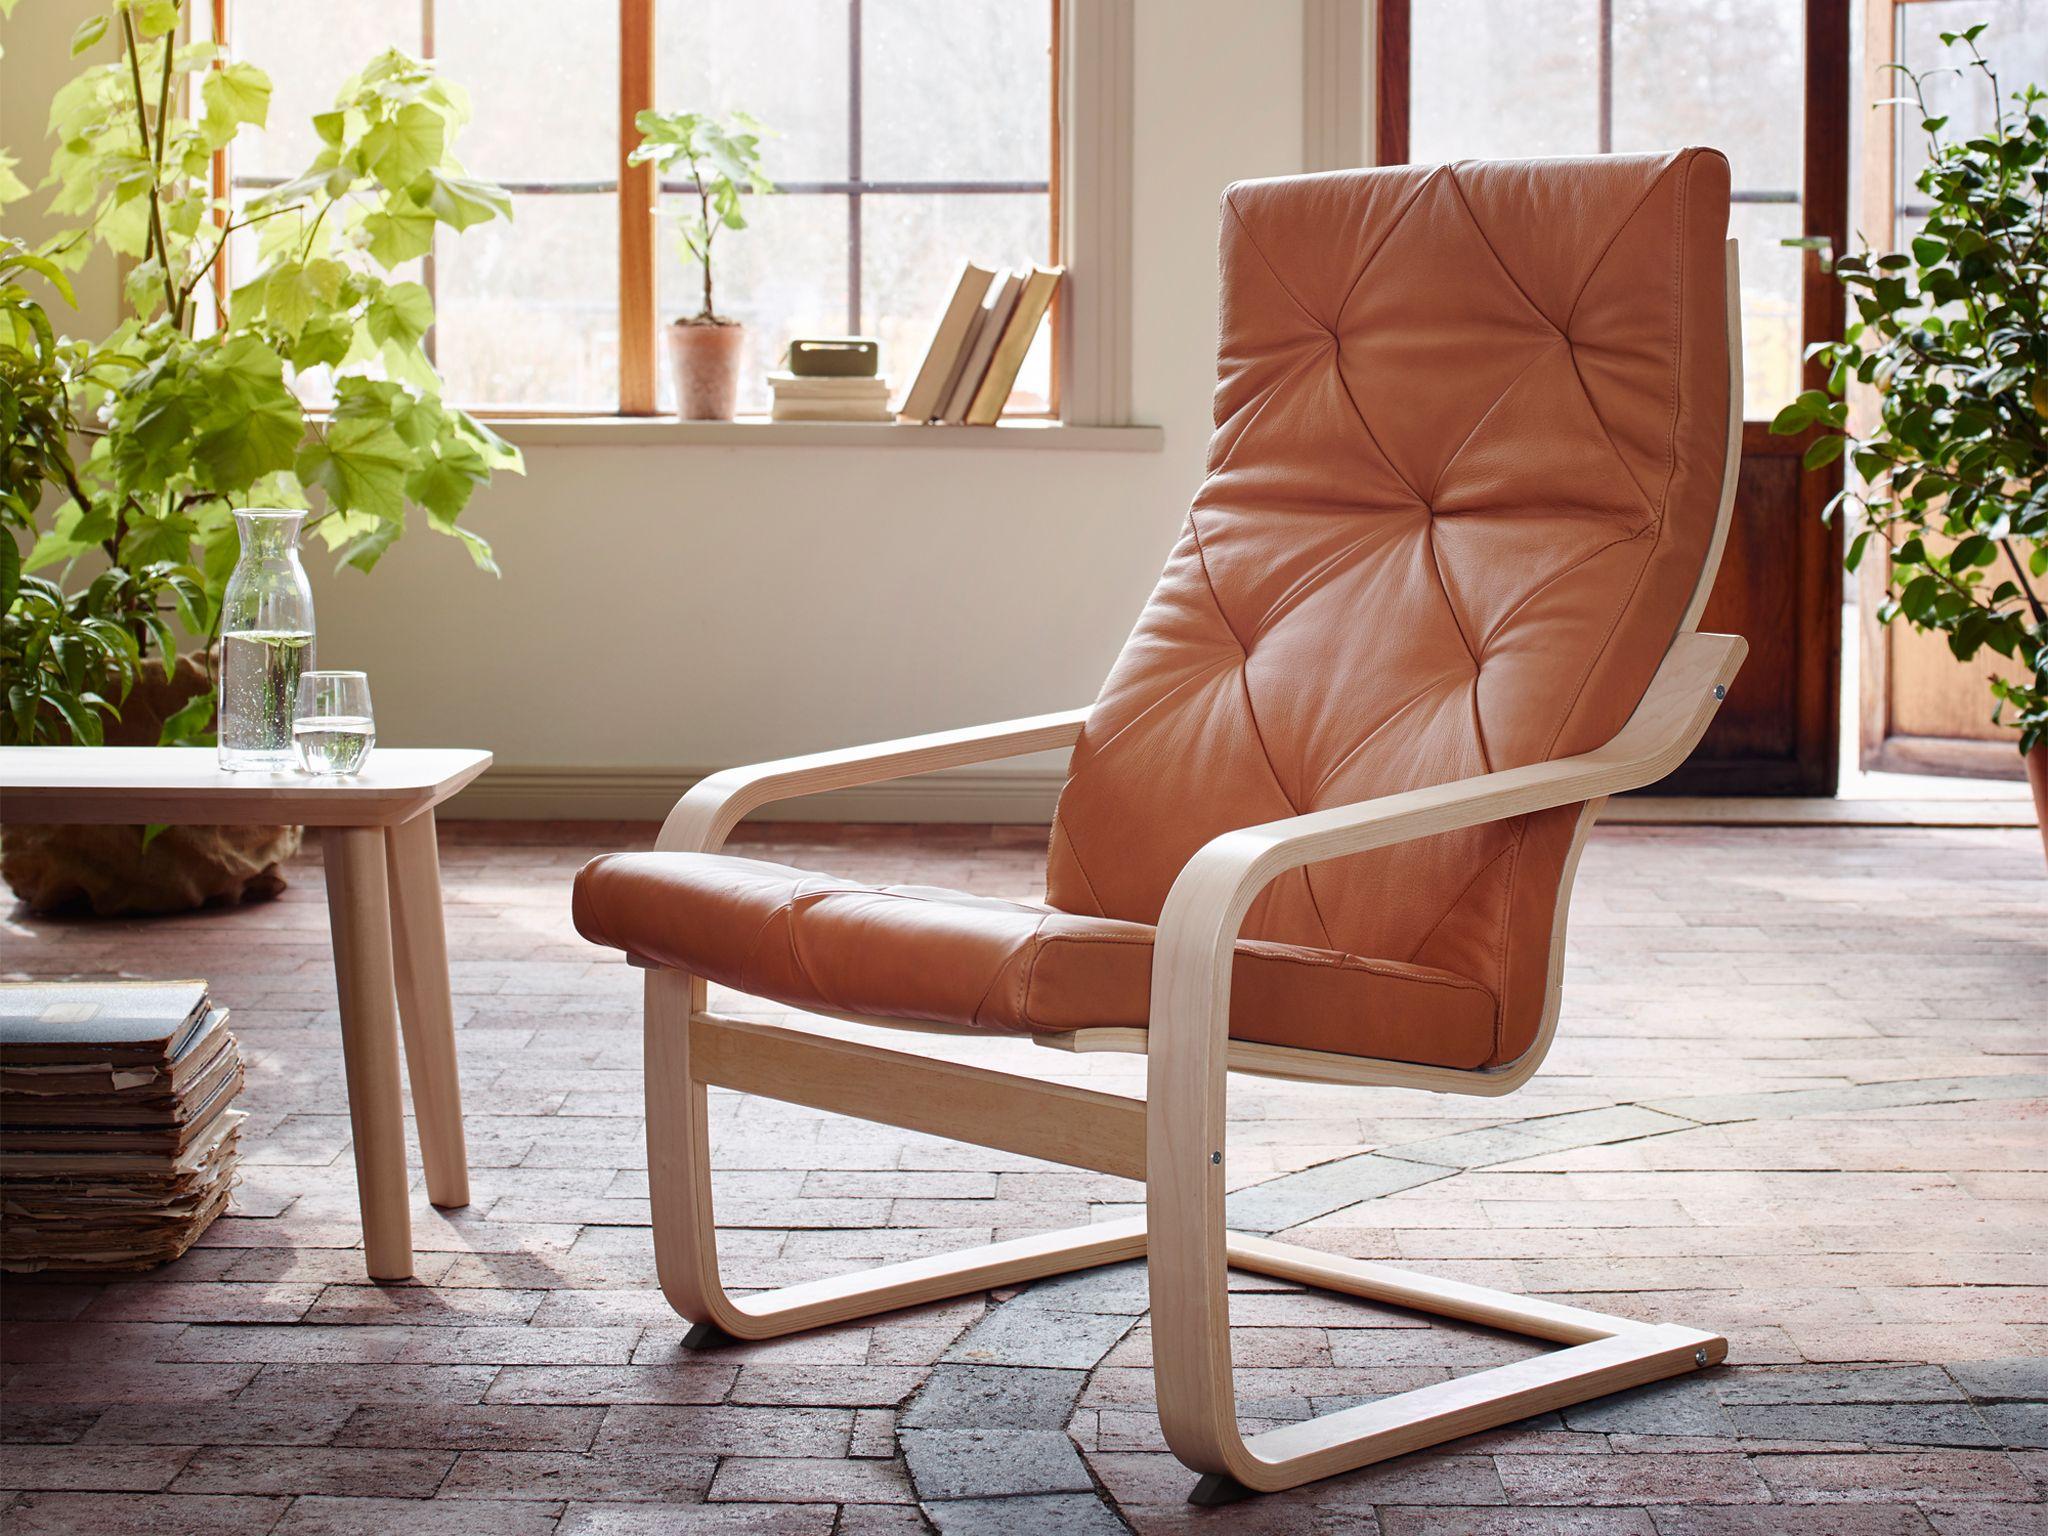 Poang Chair Cushion In 2019 Ikea Poang Chair Ikea Chair Chair